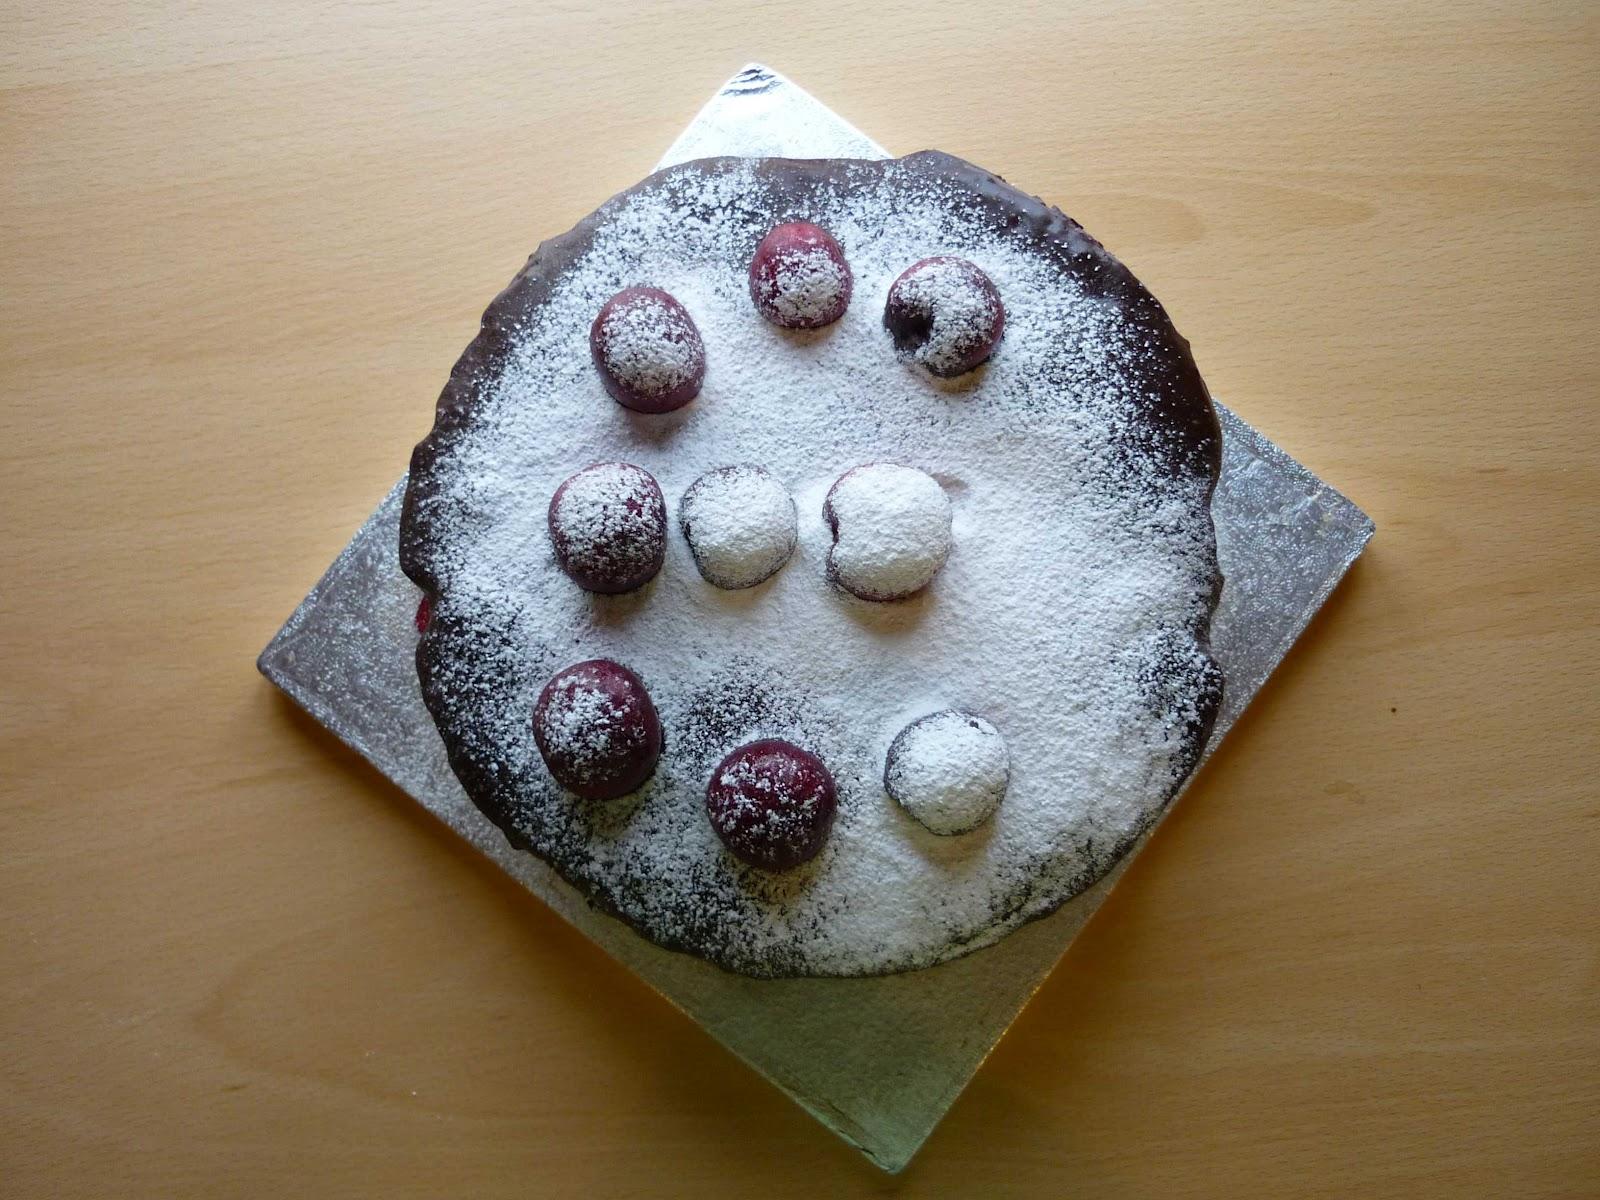 Marzipan Tea Cakes